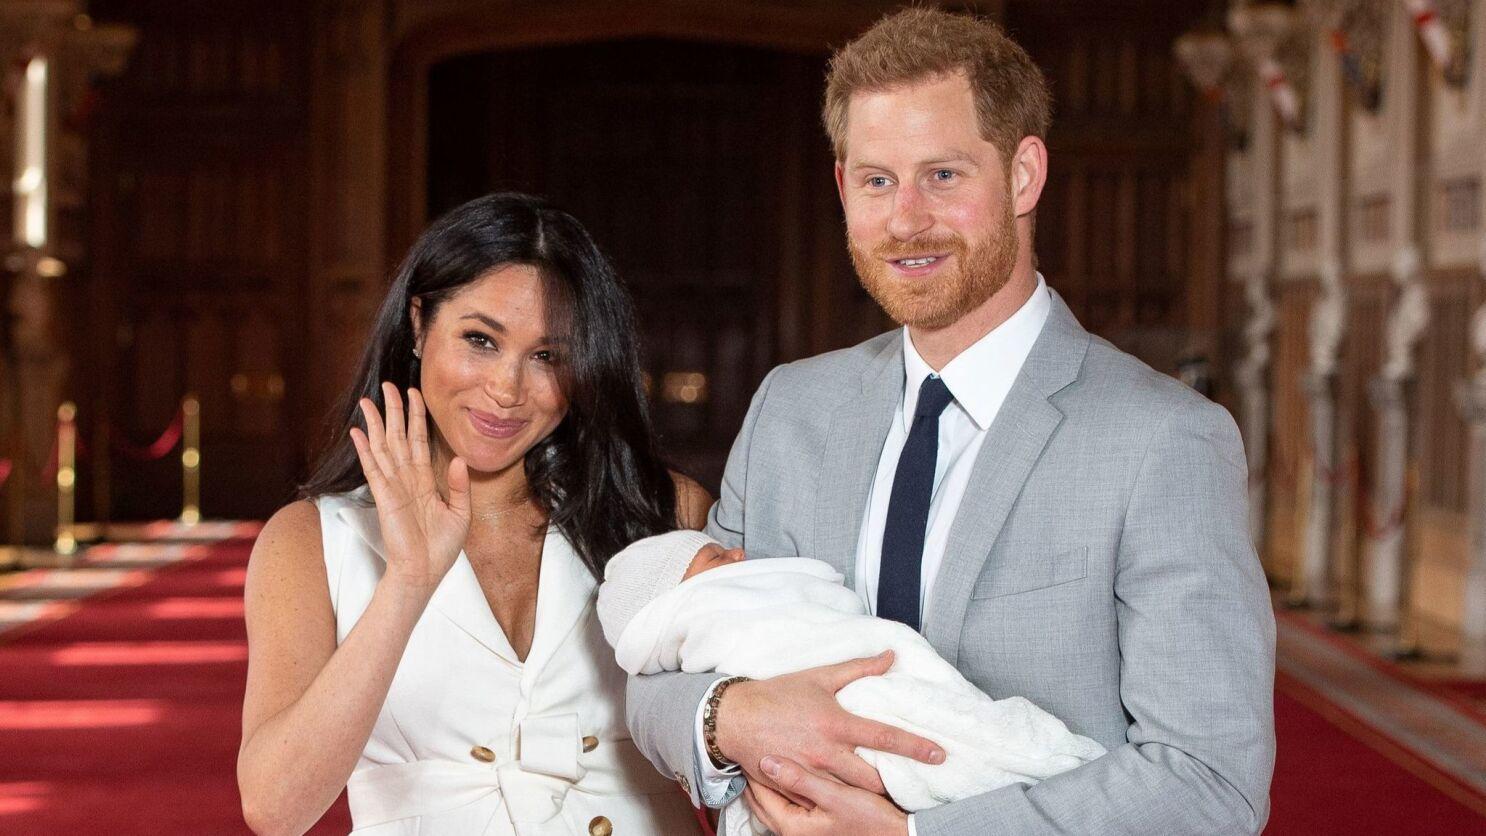 List of living British princes and princesses